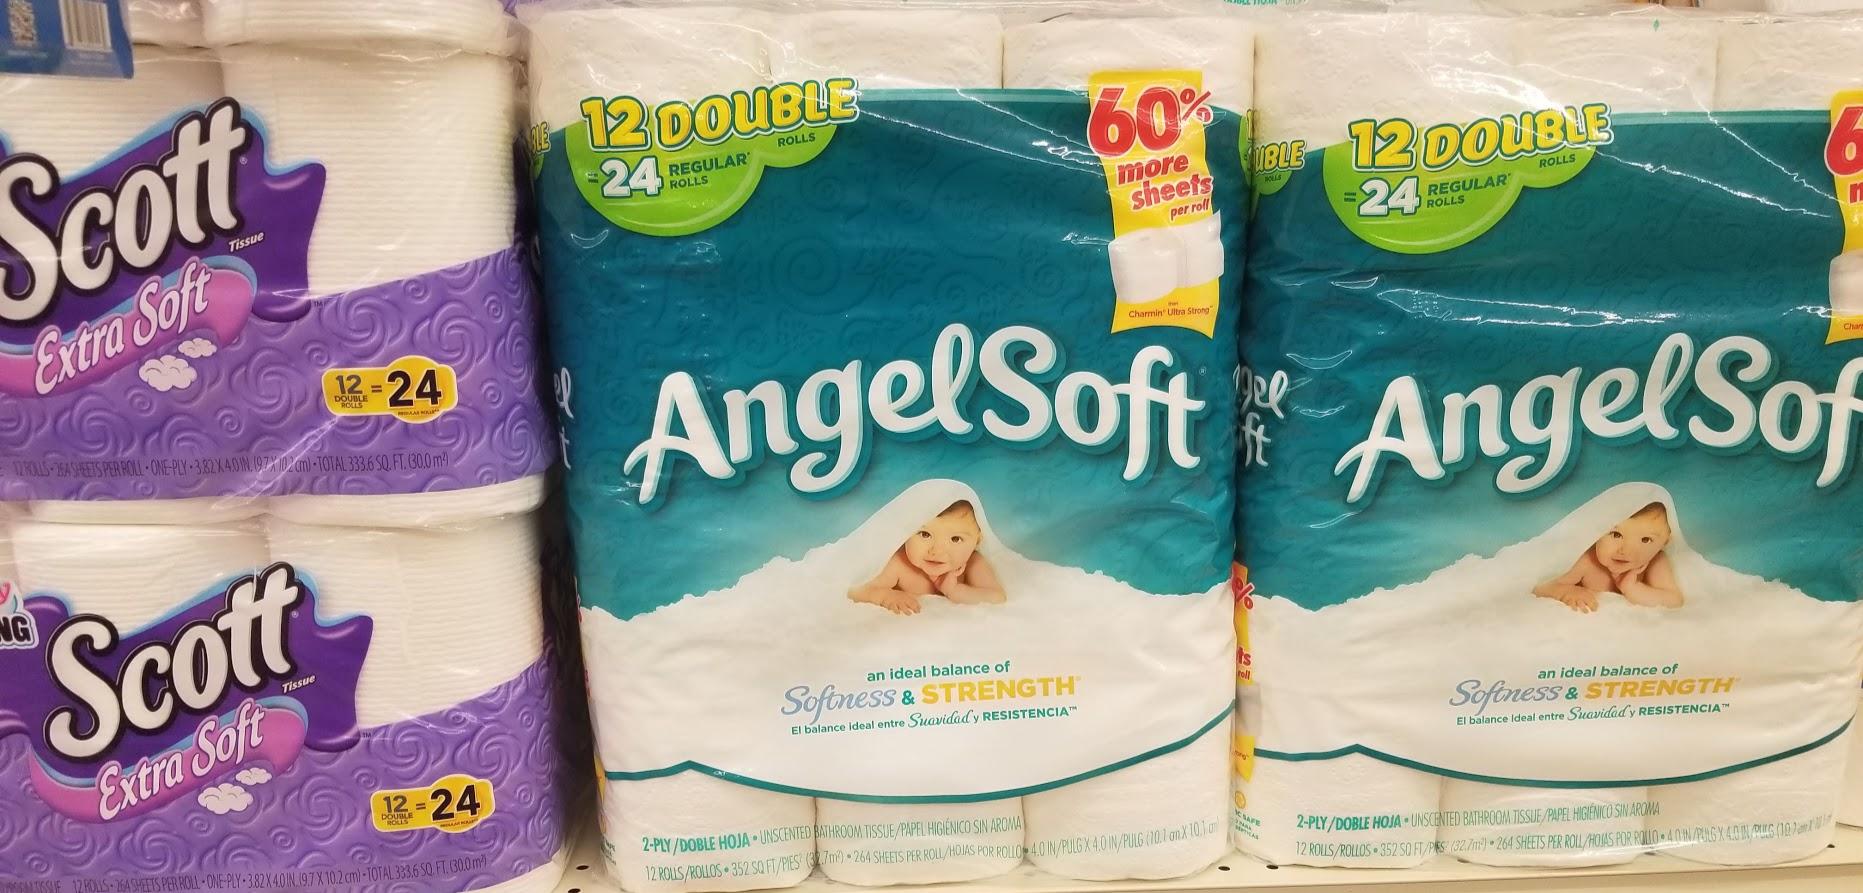 Angel Soft Bath Tissue Printable Coupon Deal at Walgreens!!